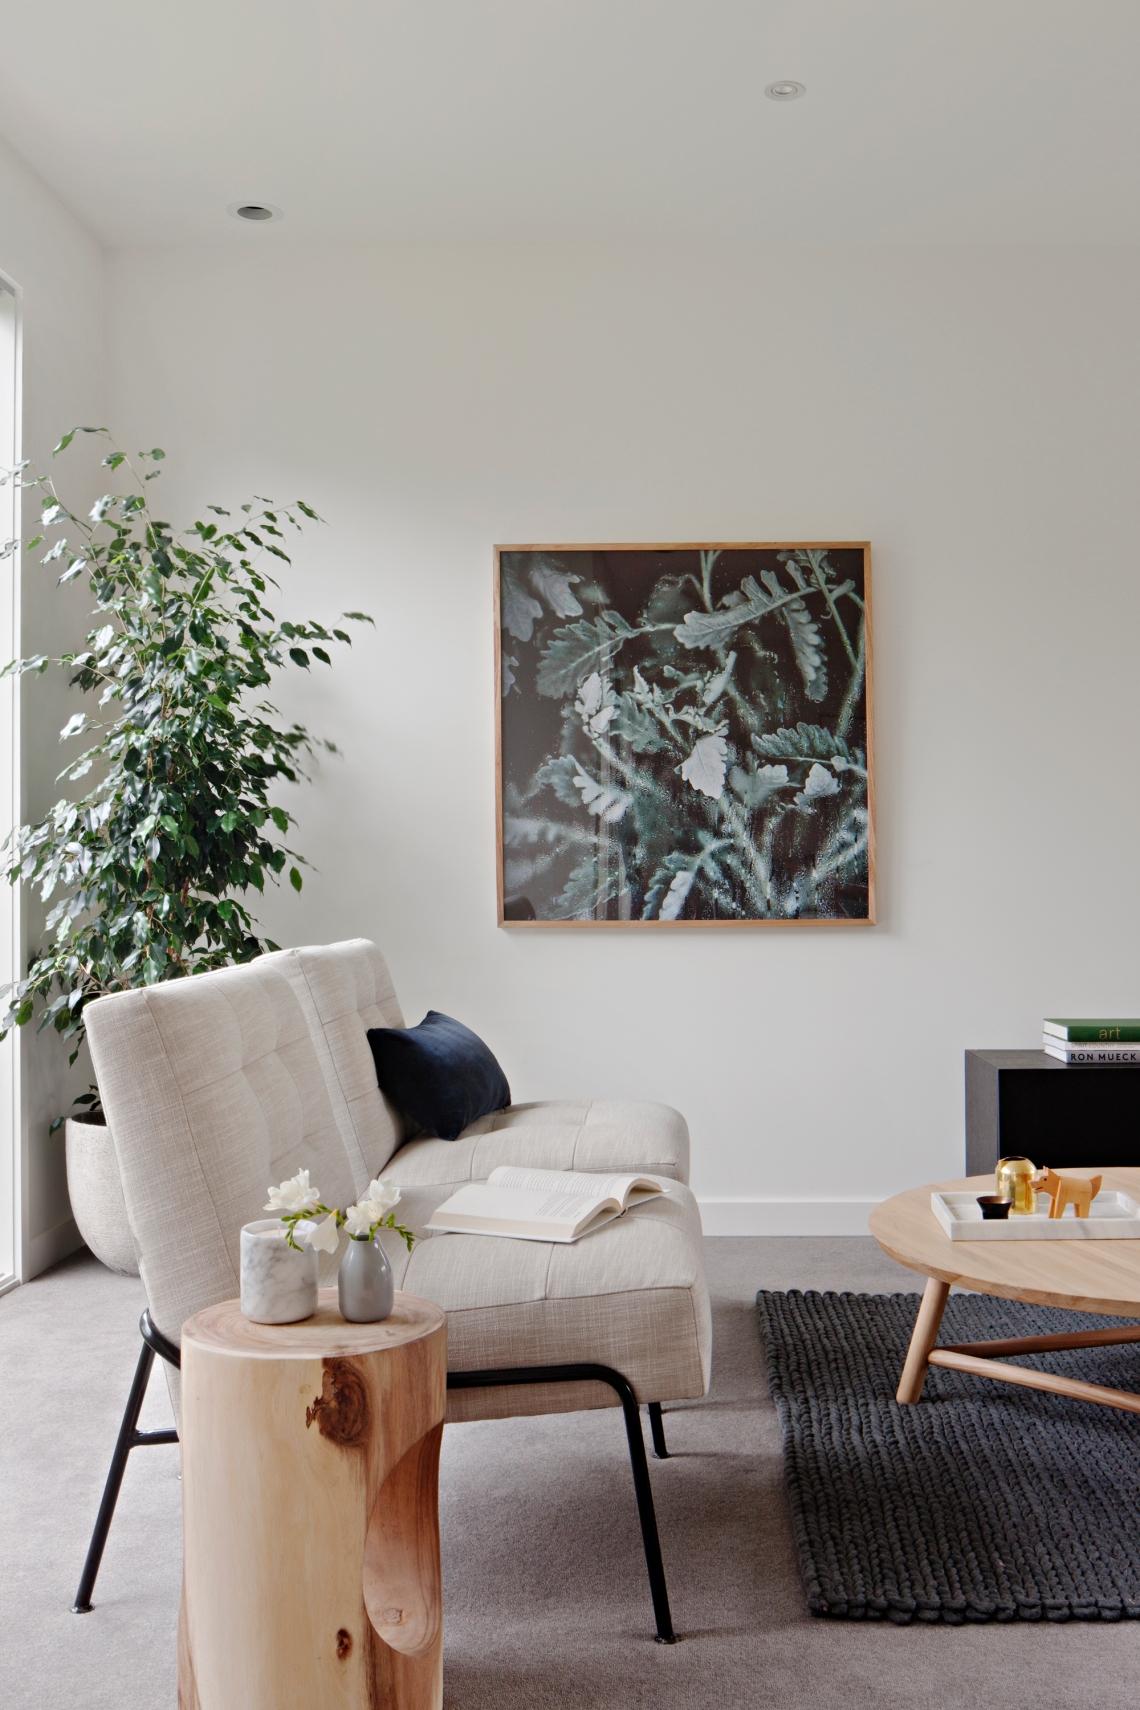 Property styling in Australia, Australiana style